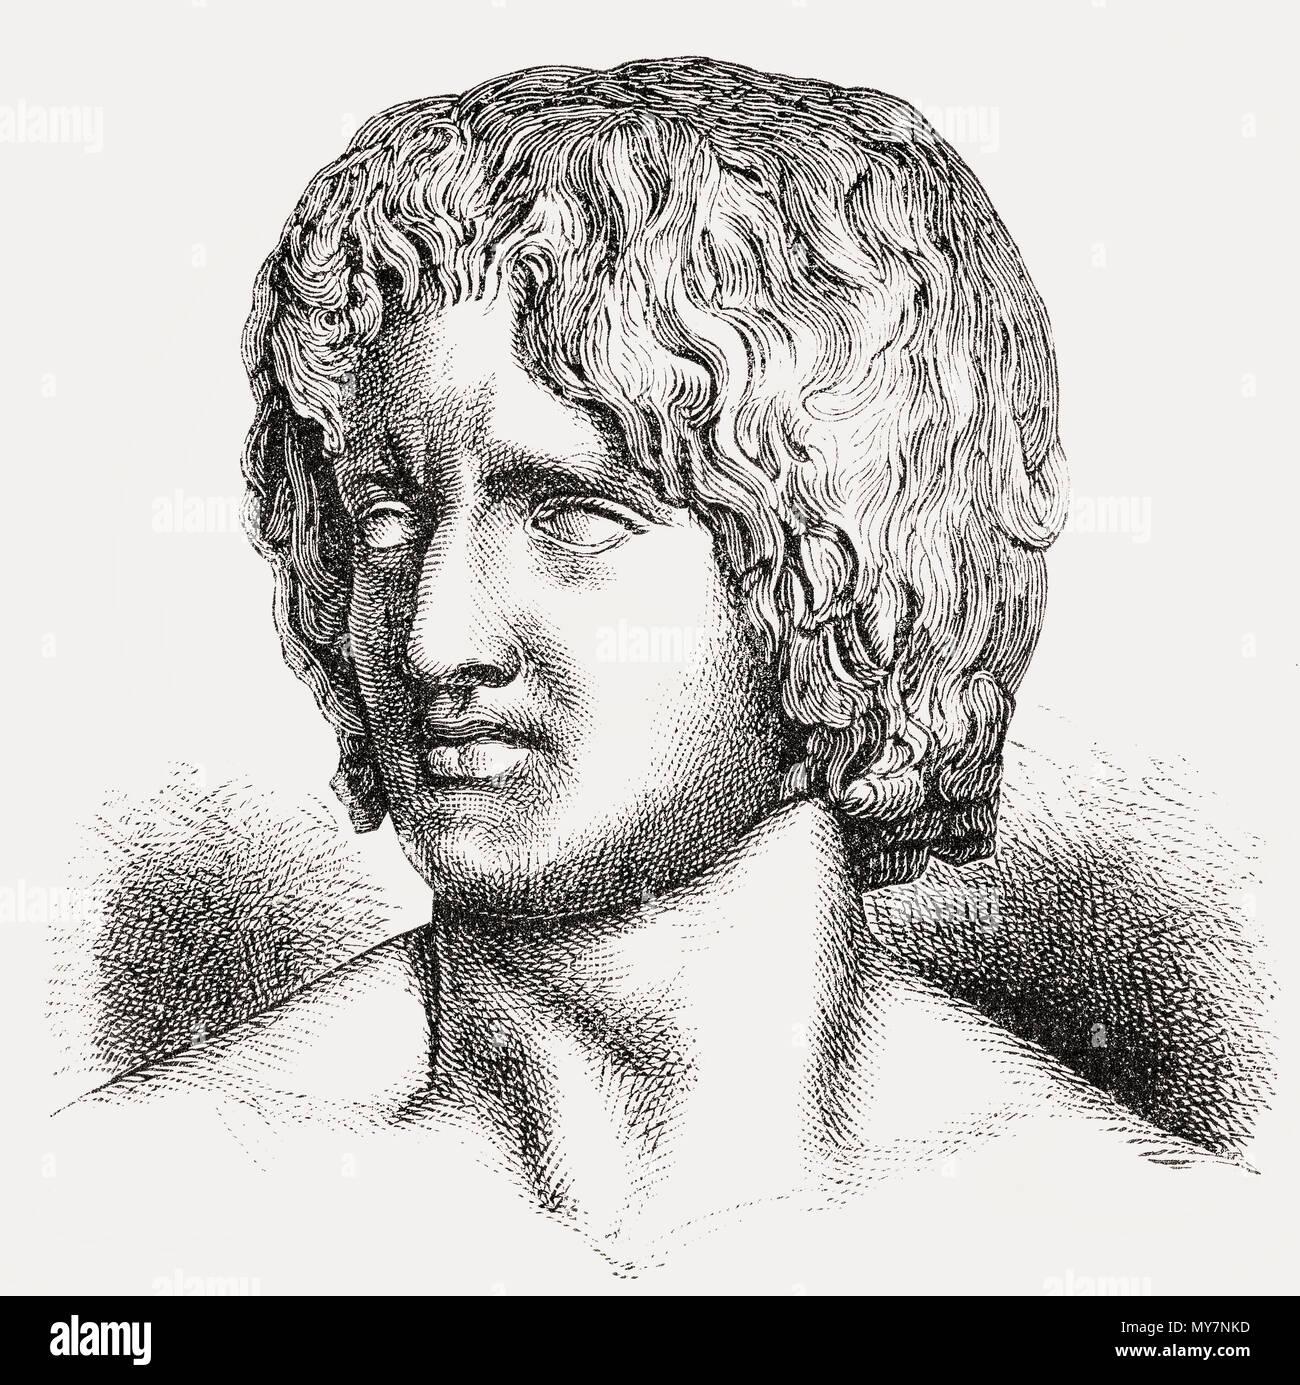 Arminius o Armenius, 17 BC - 21 AD, capotribù dei Cherusci germanica, generale vittorioso del varo battaglia in Germania, Immagini Stock